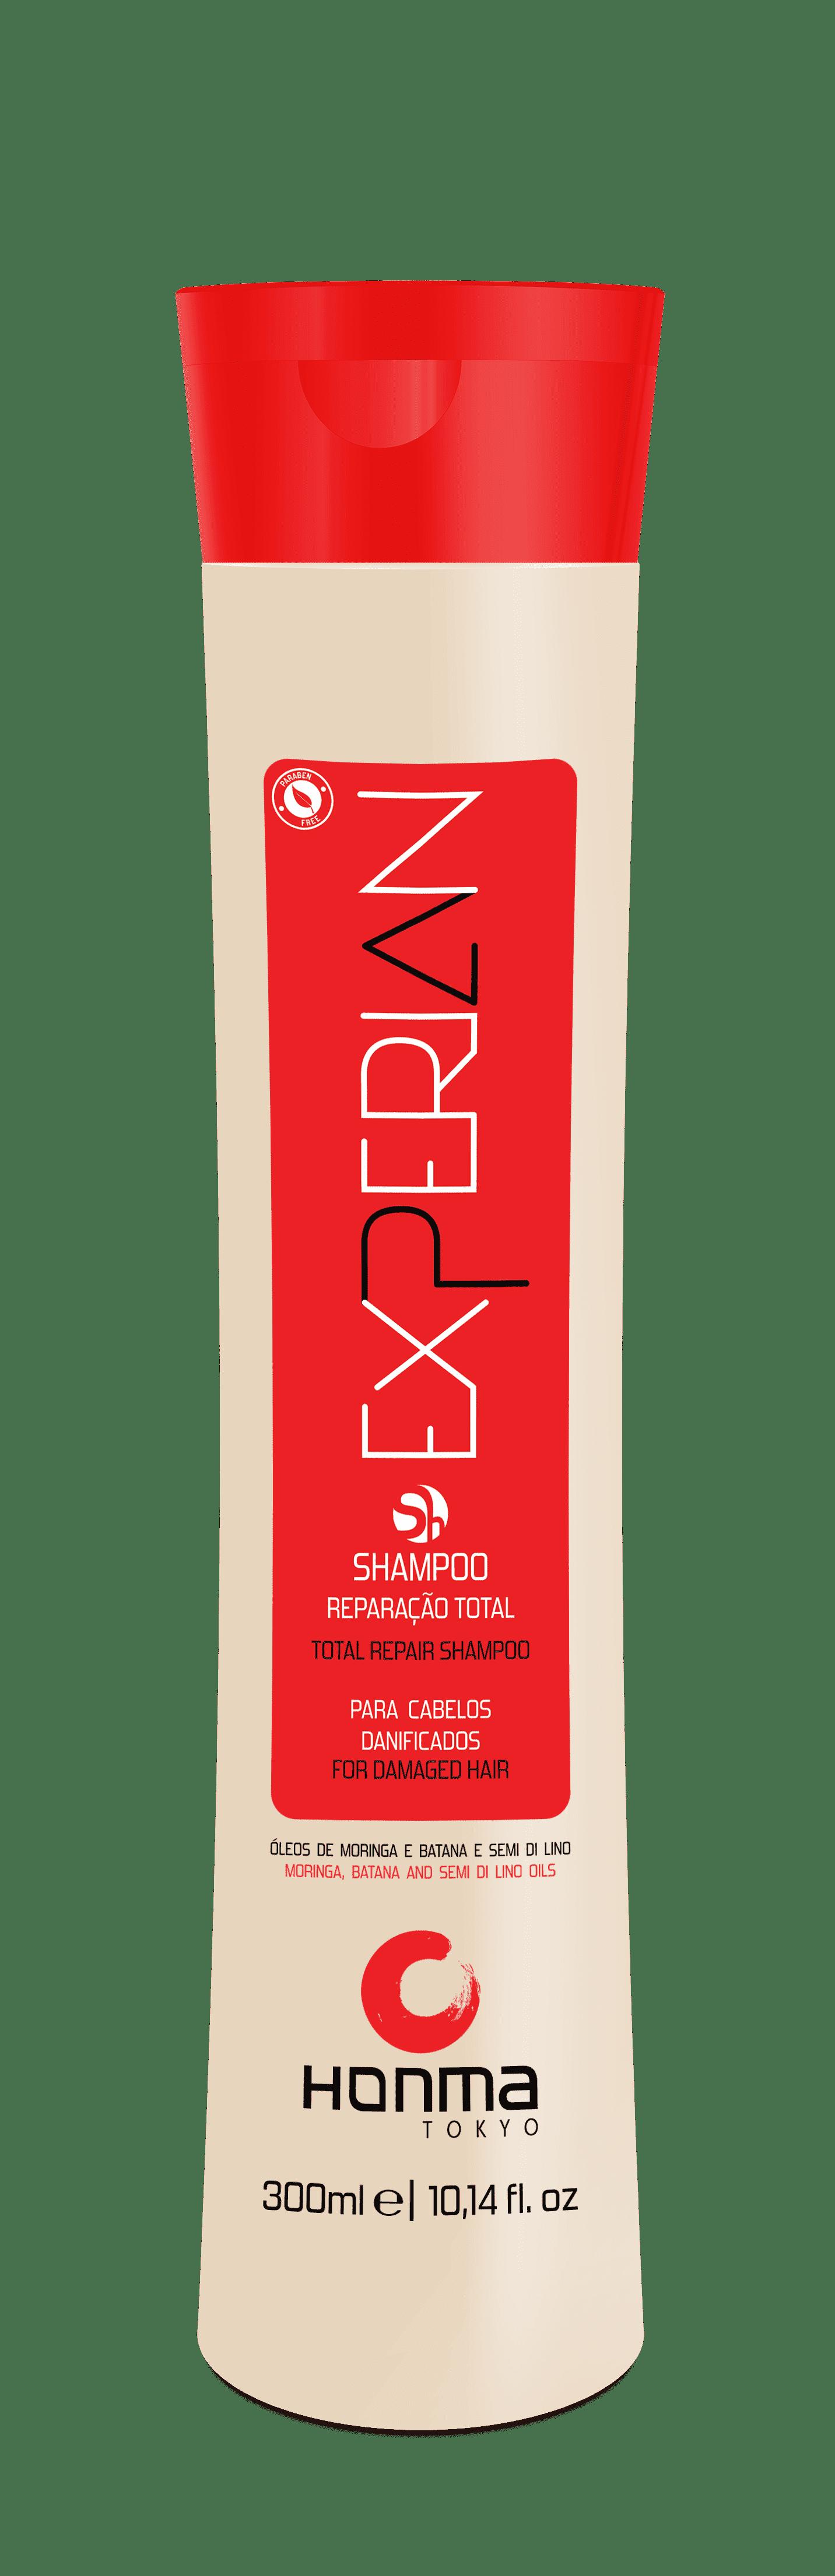 Шампунь Линии «Experian» Хонма Токио, 300 мл шампунь линии experian 300 мл